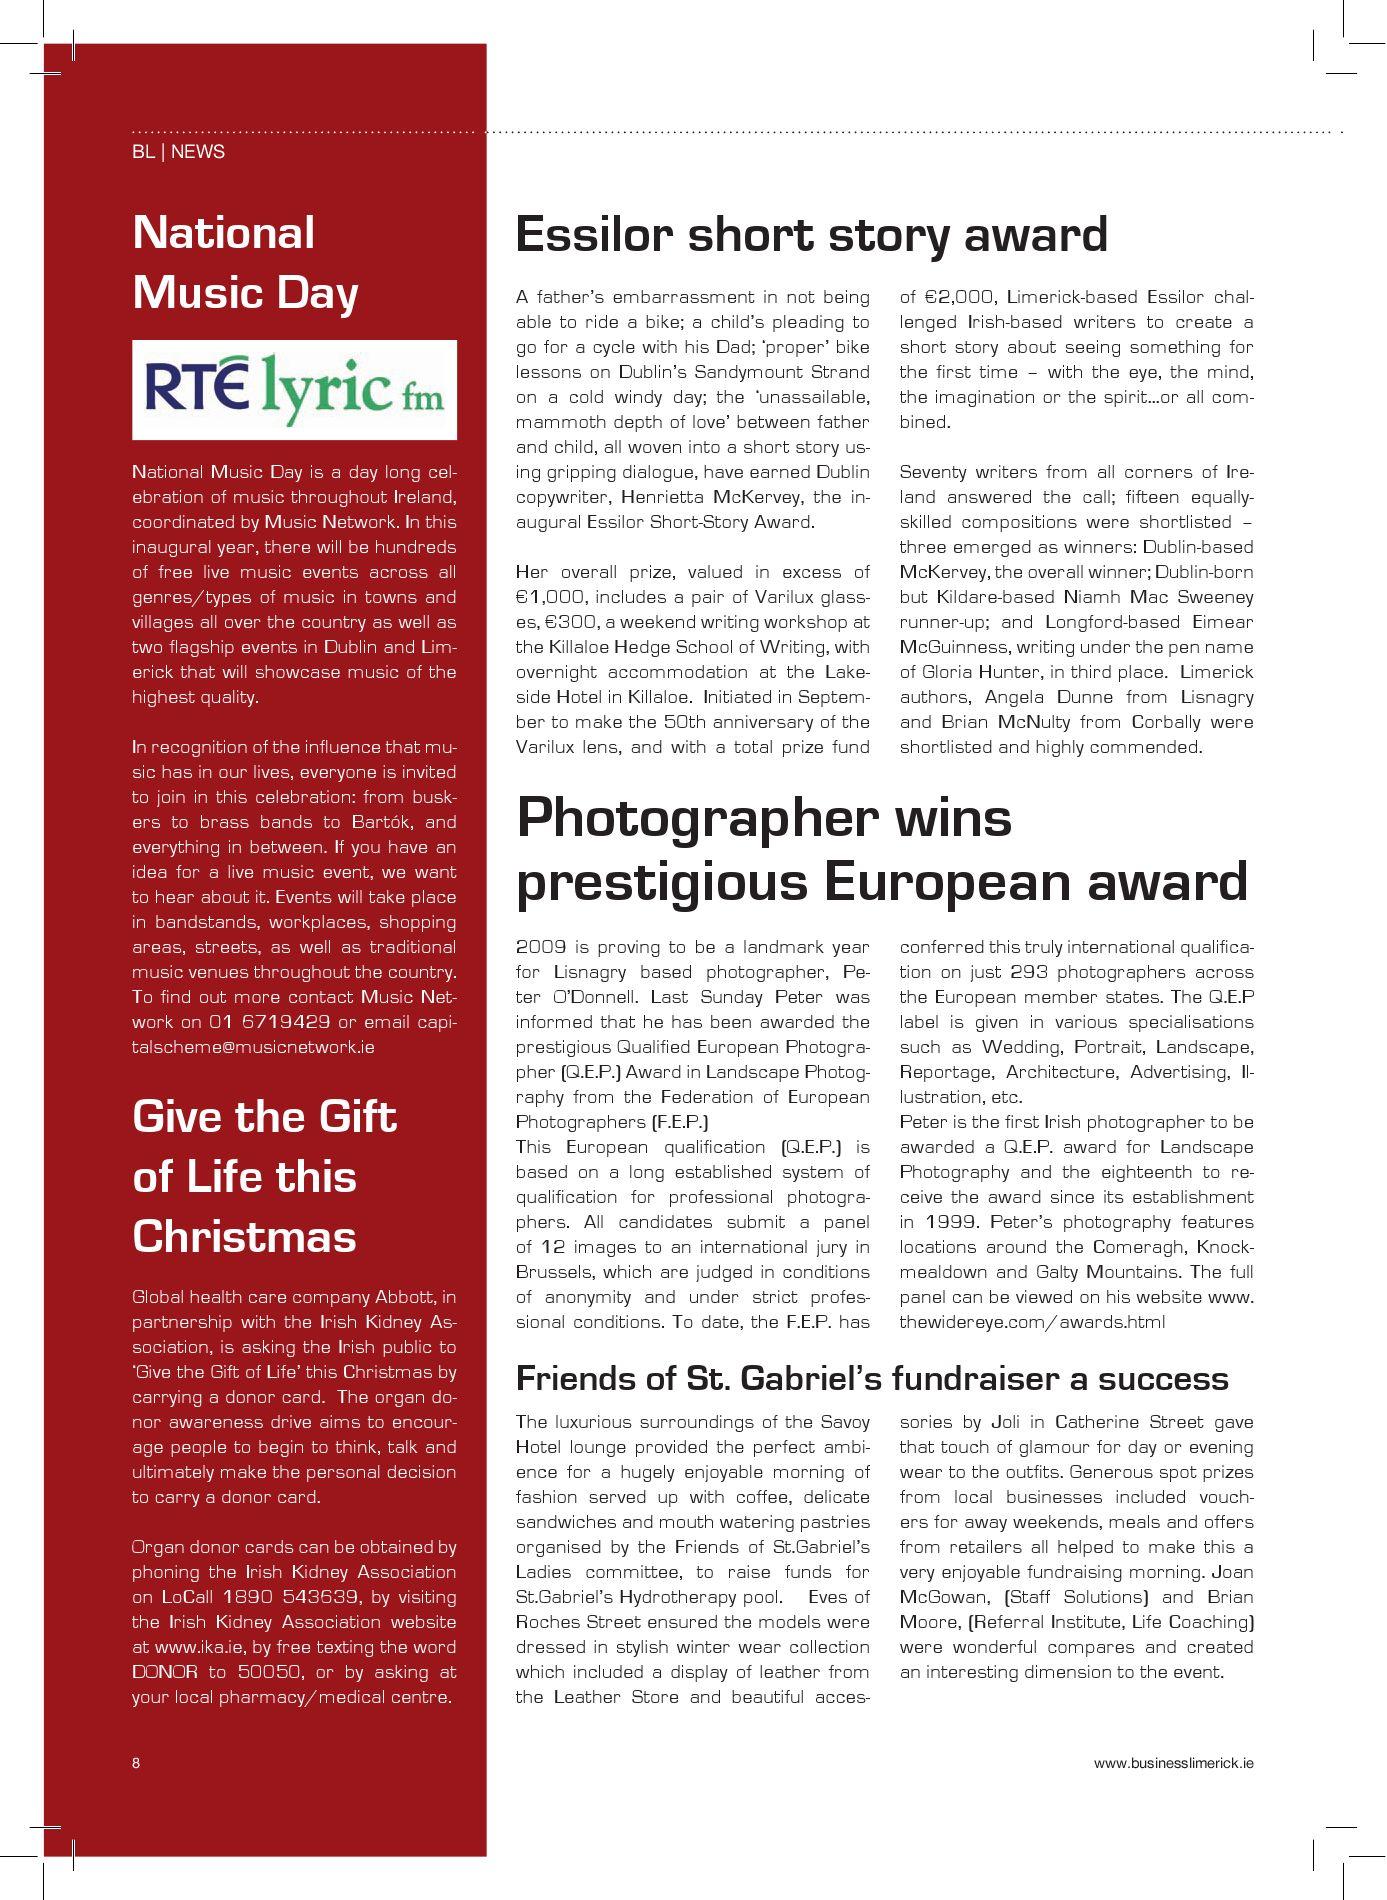 Business Limerick Magazine 01/10 by Business Limerick - issuu